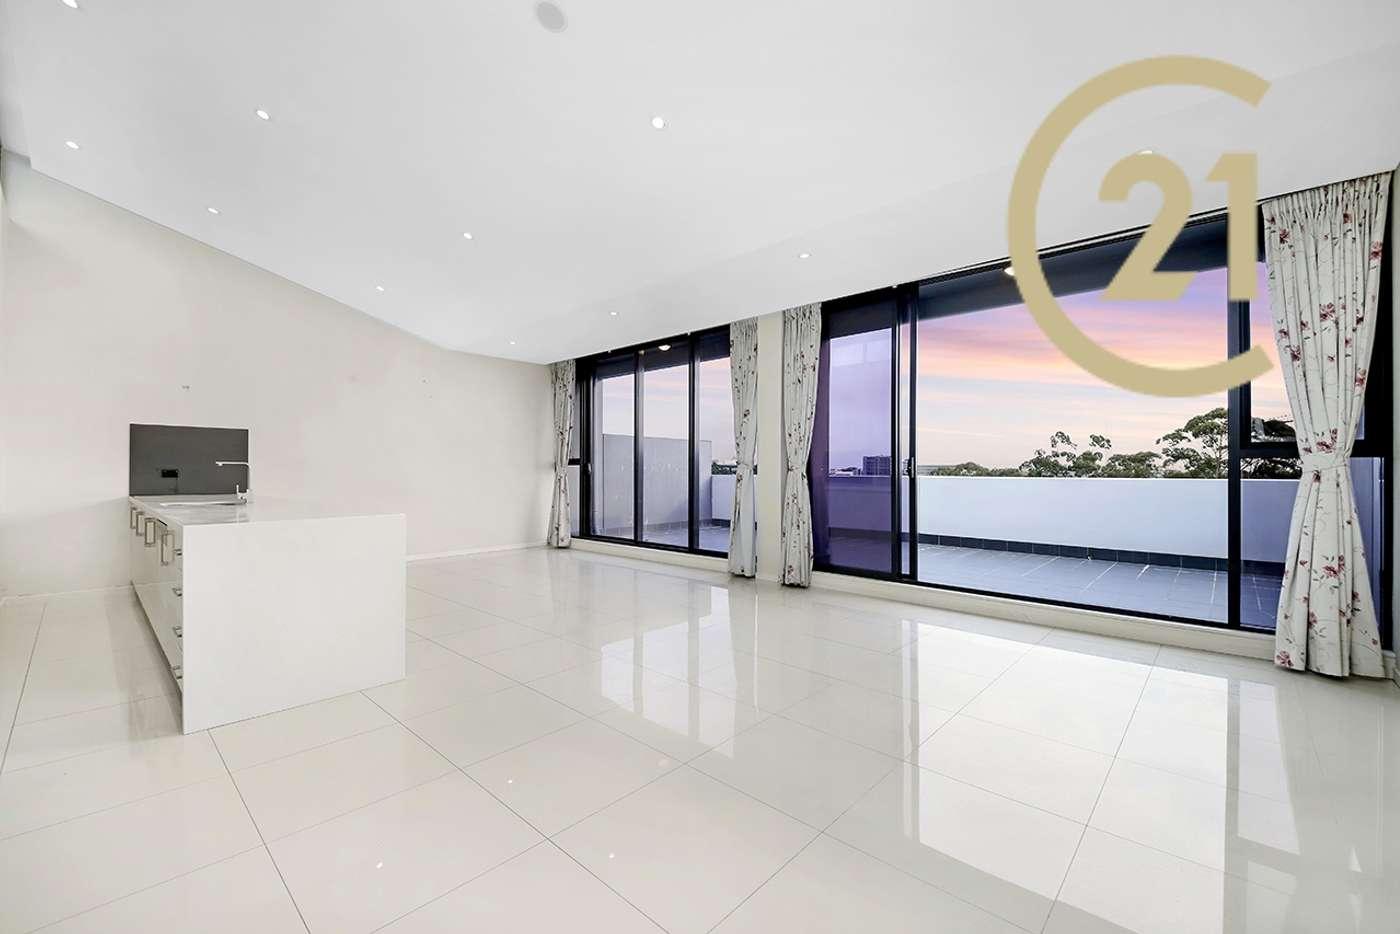 Main view of Homely apartment listing, 612/1 Lamond Lane, Zetland NSW 2017